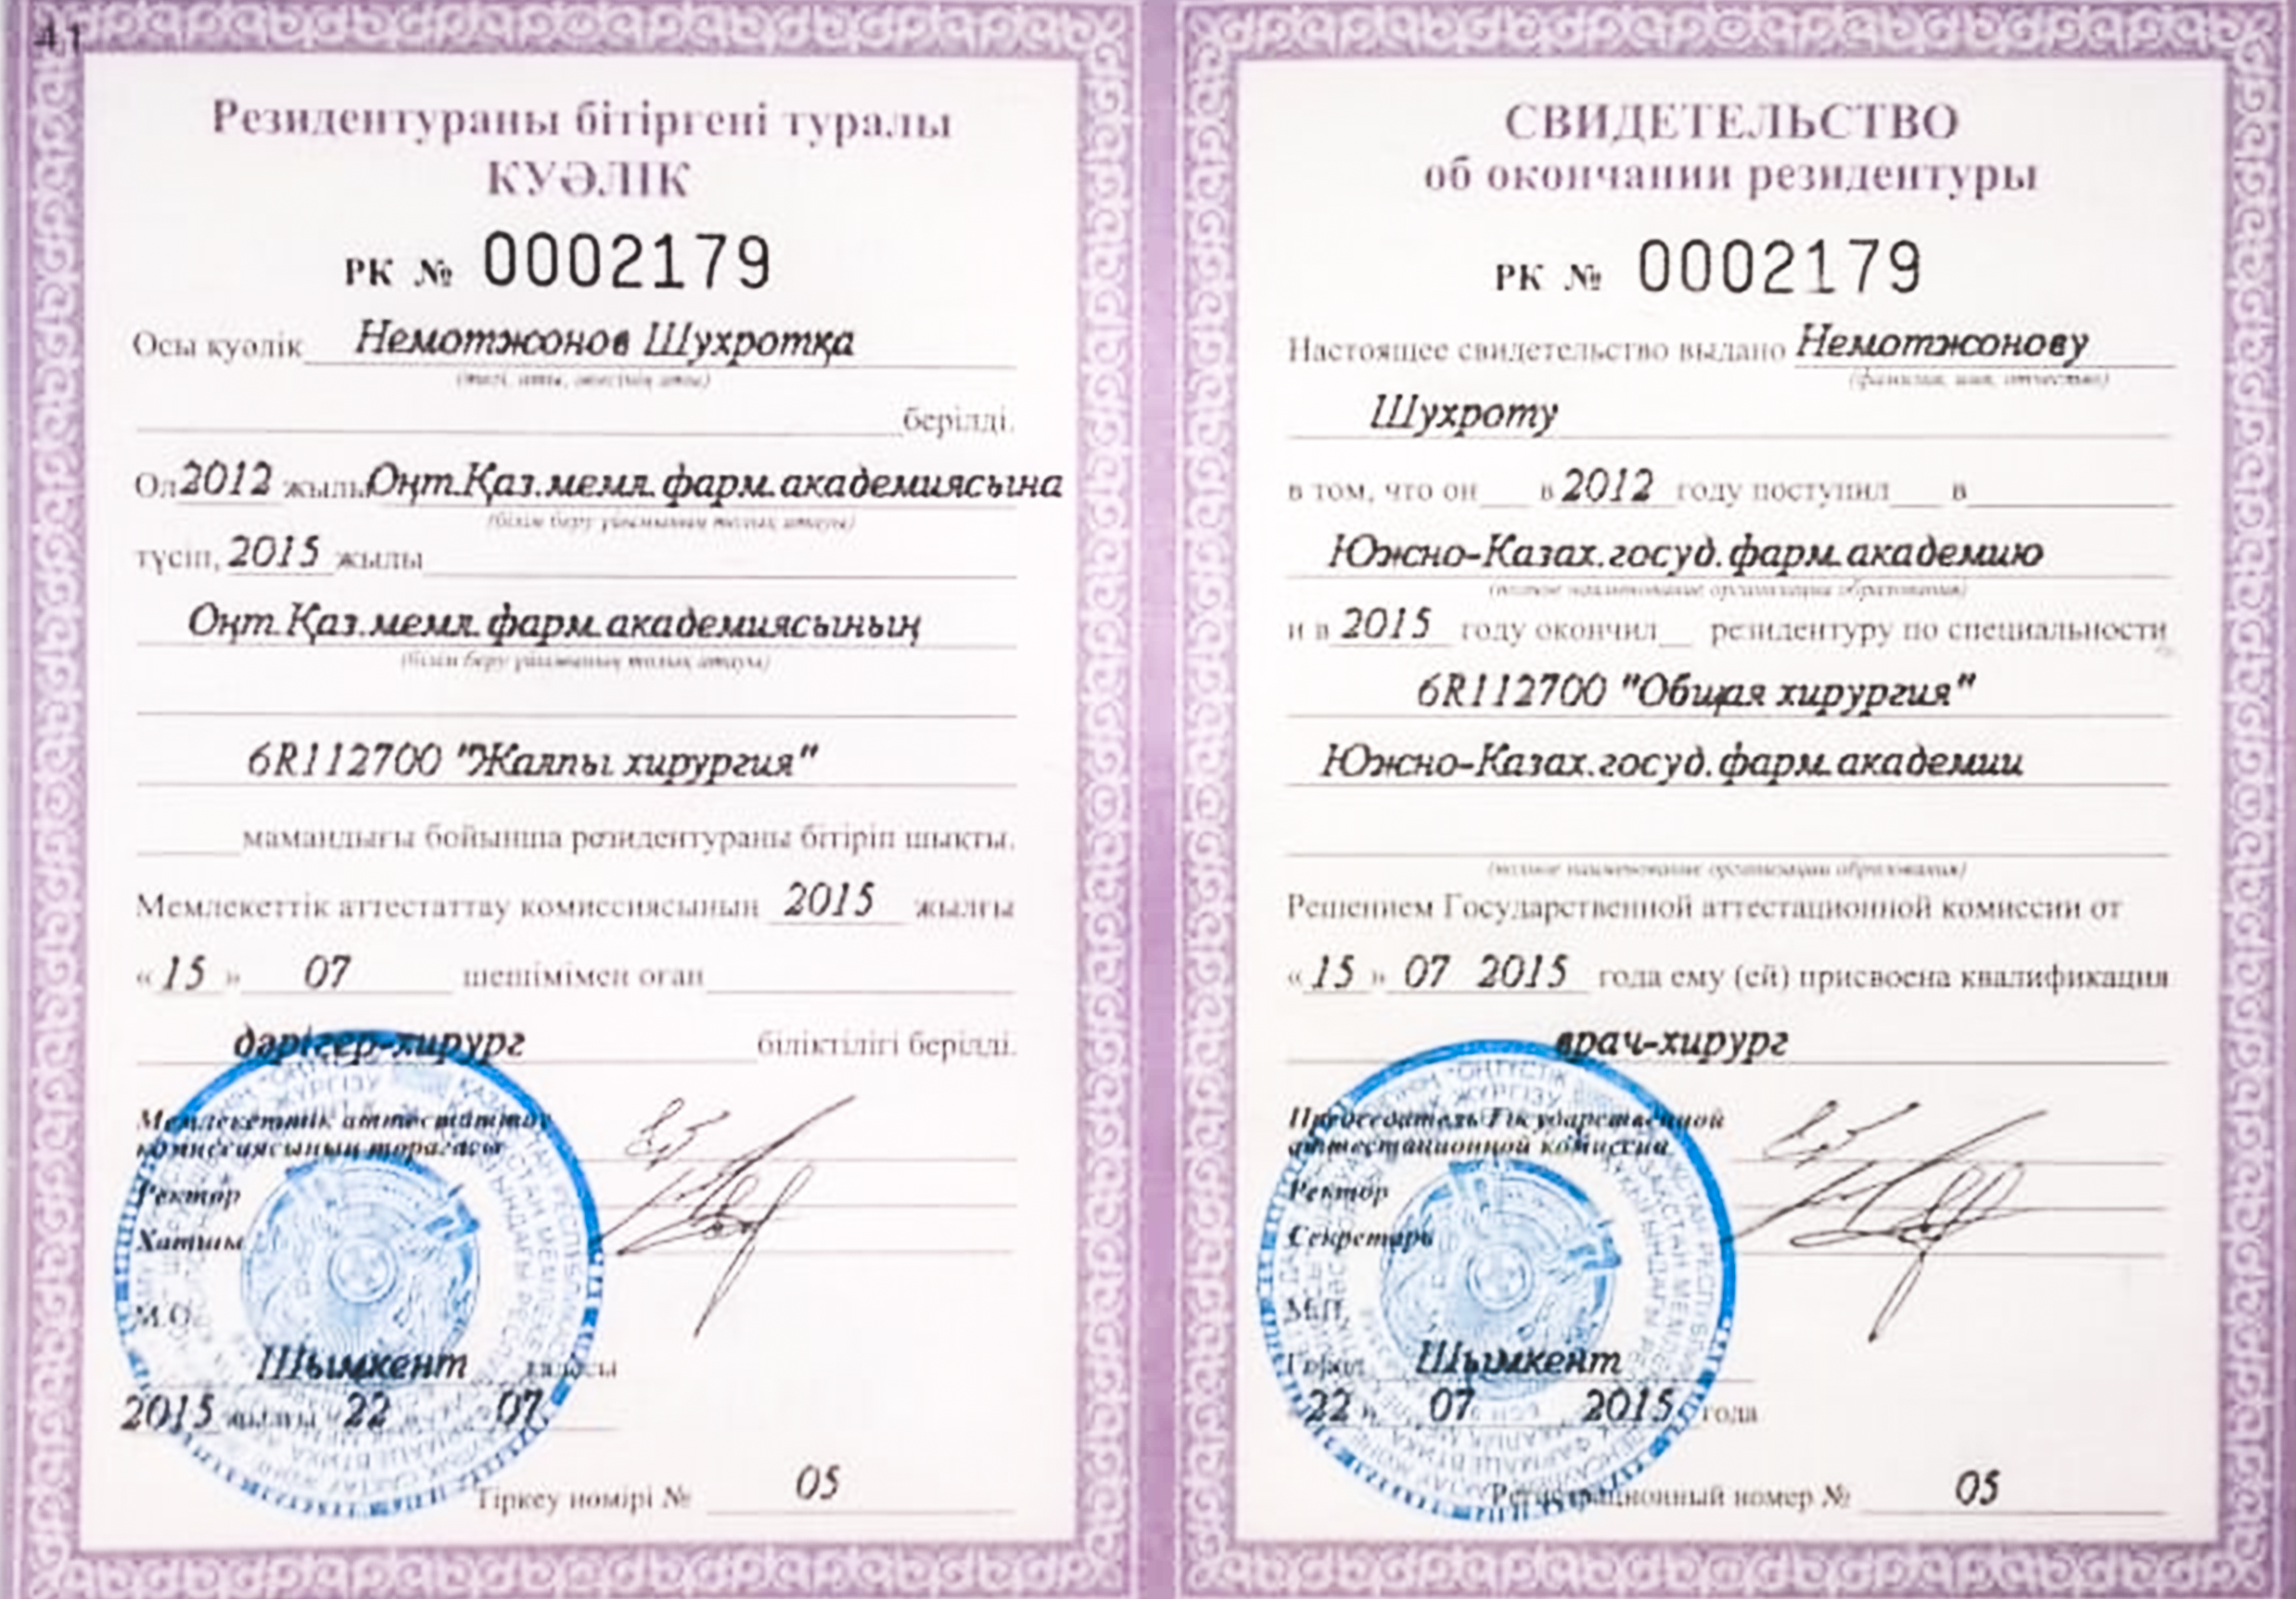 Резидентура Проктолога врача клиники Akniet Shipa сайрамский р-н. с. Карабулак